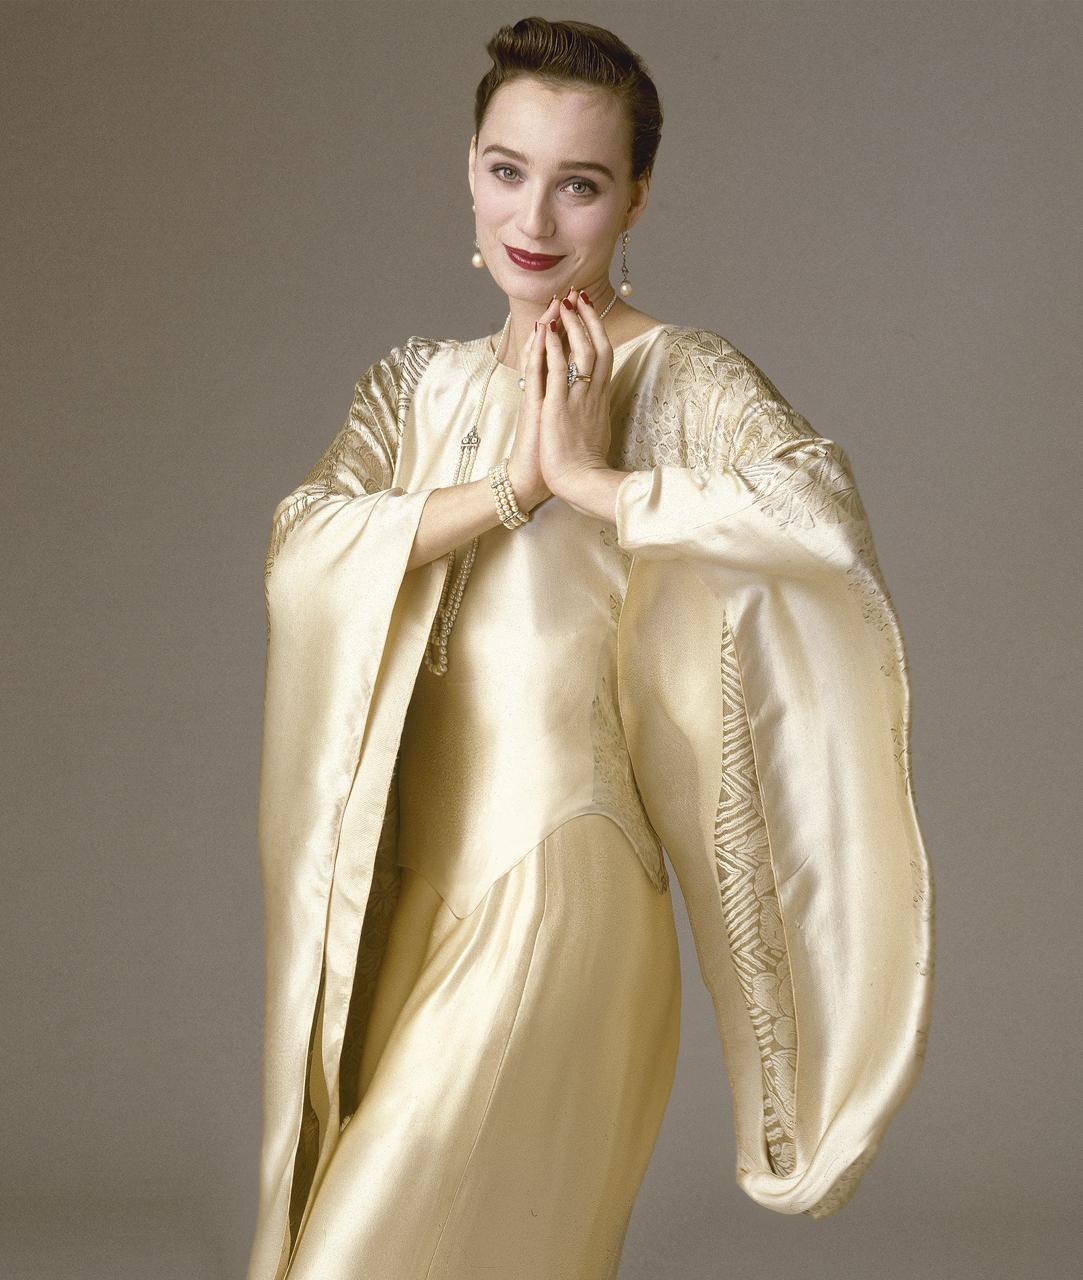 Kristen-Scott-Thomas.Gold-Satin-Dress.Arrowsmith